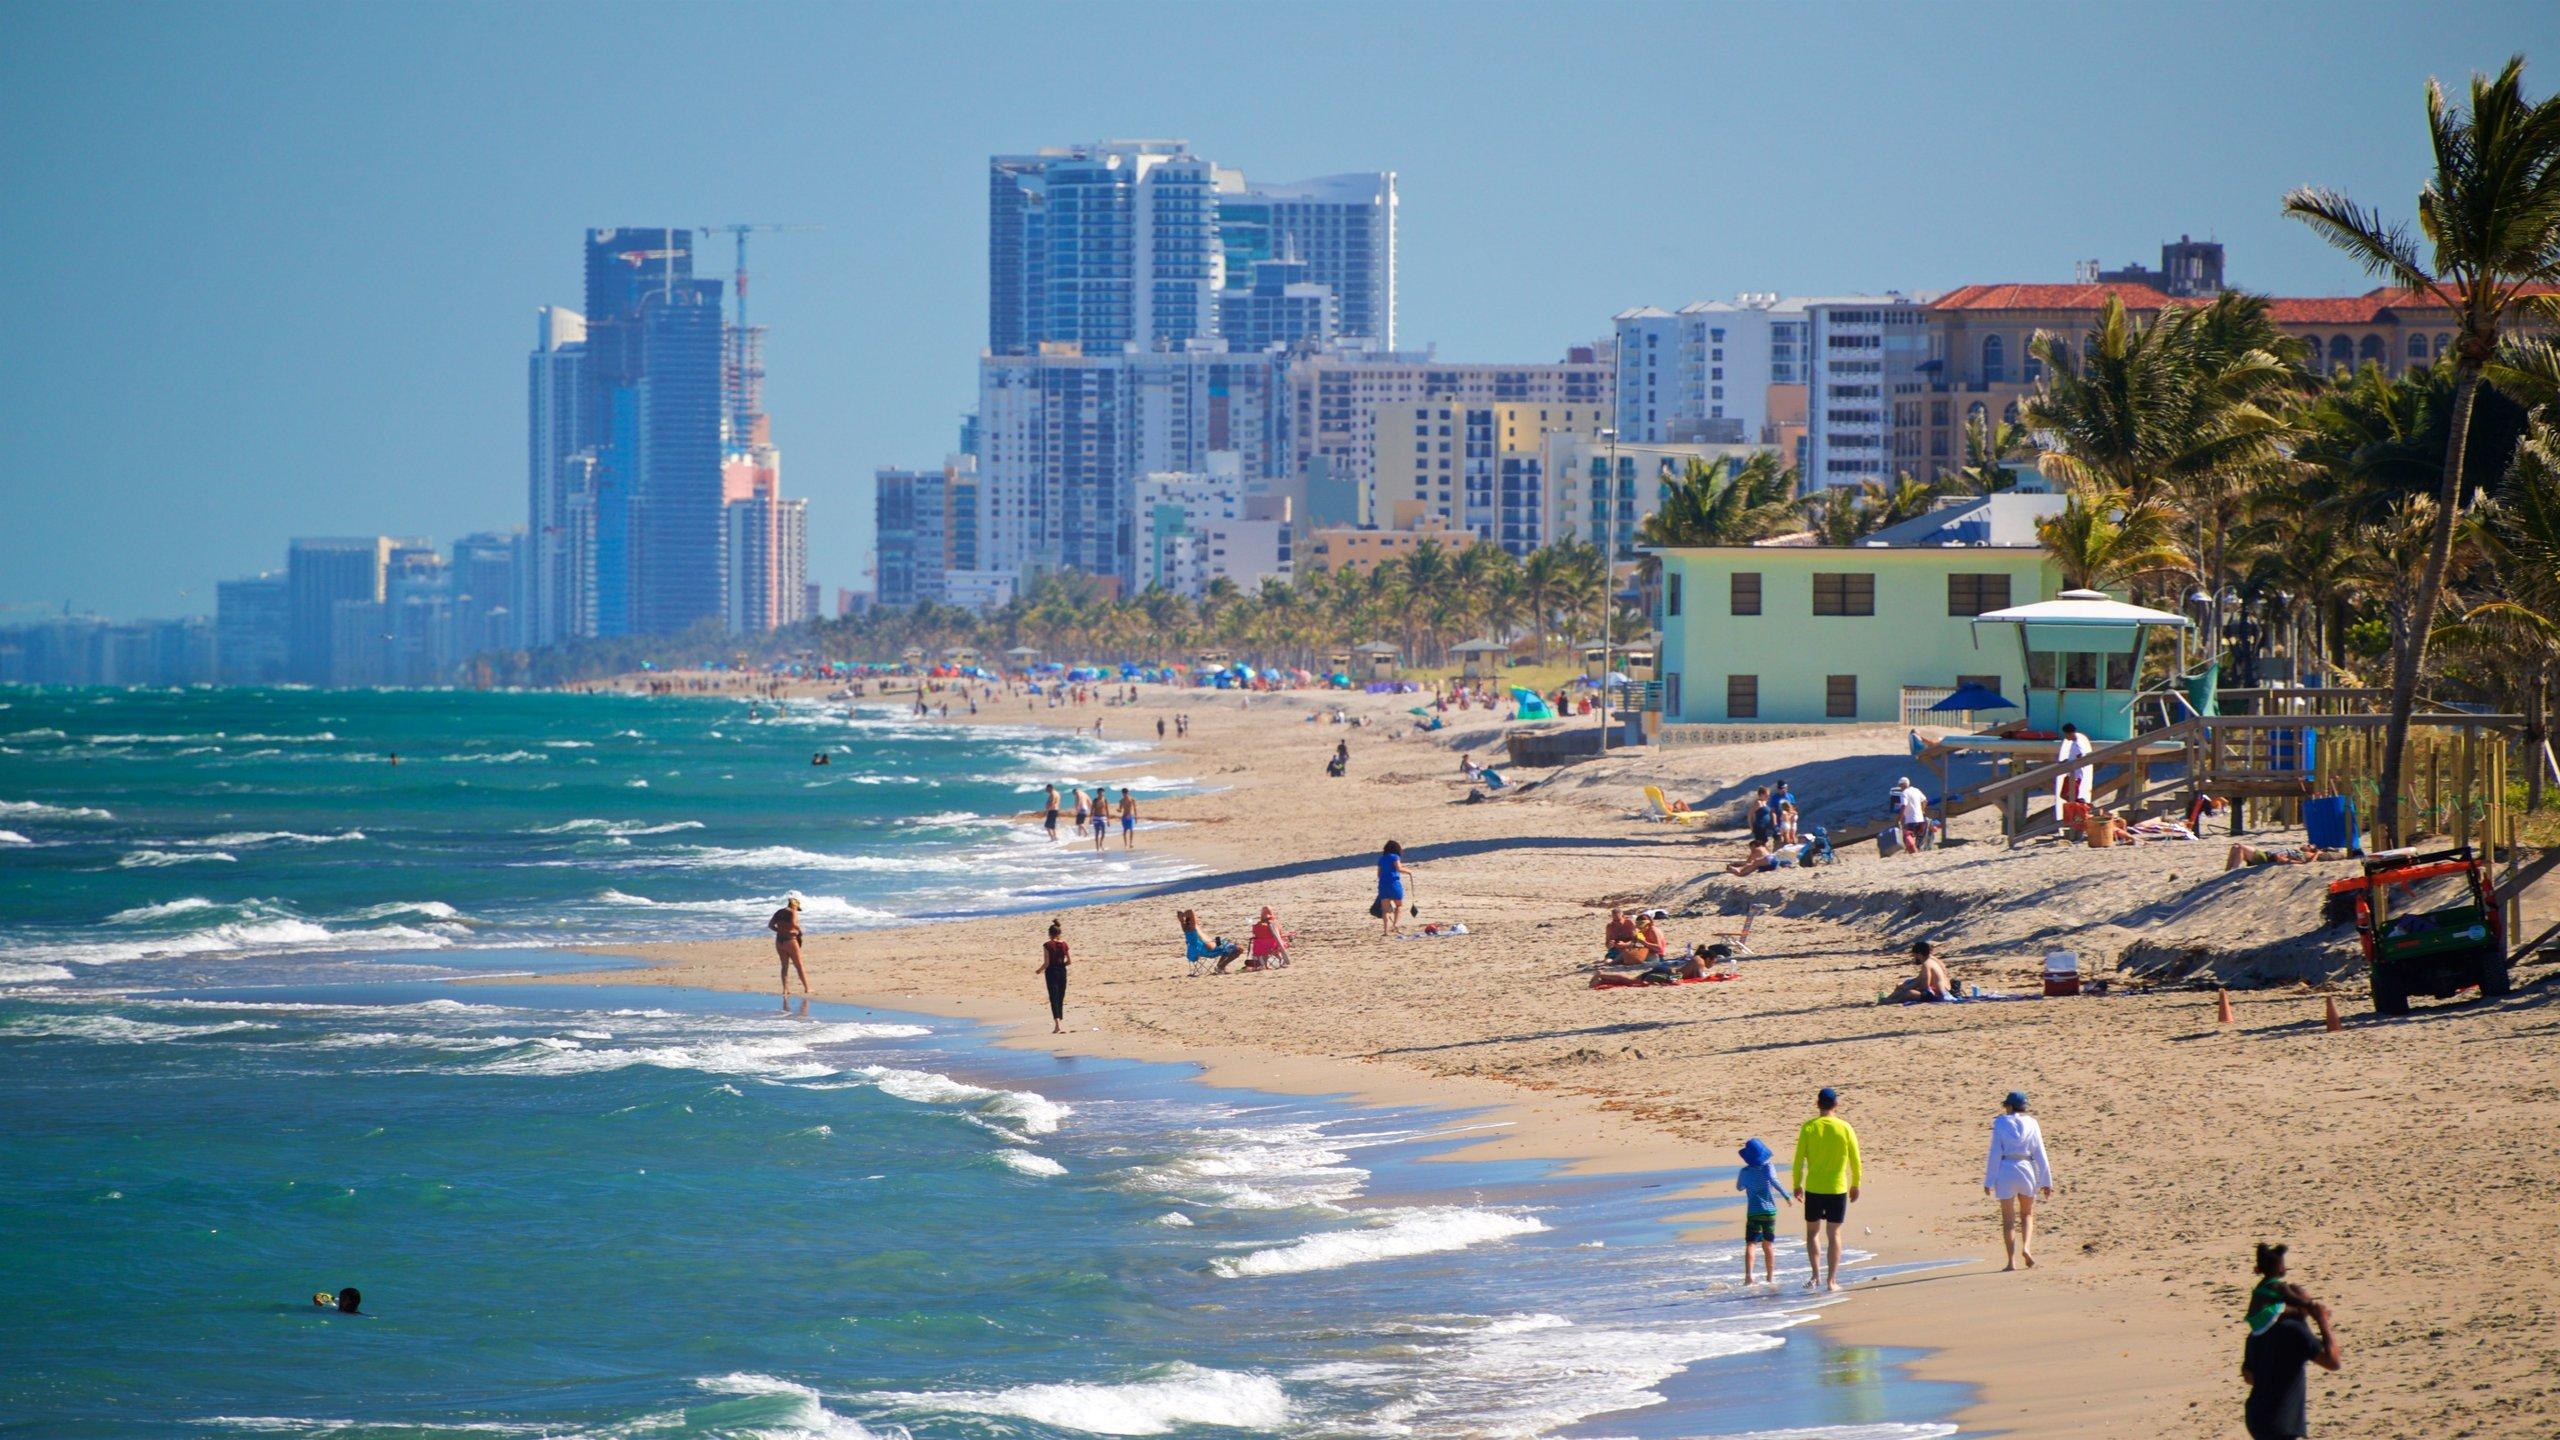 Dania Beach, Florida, USA